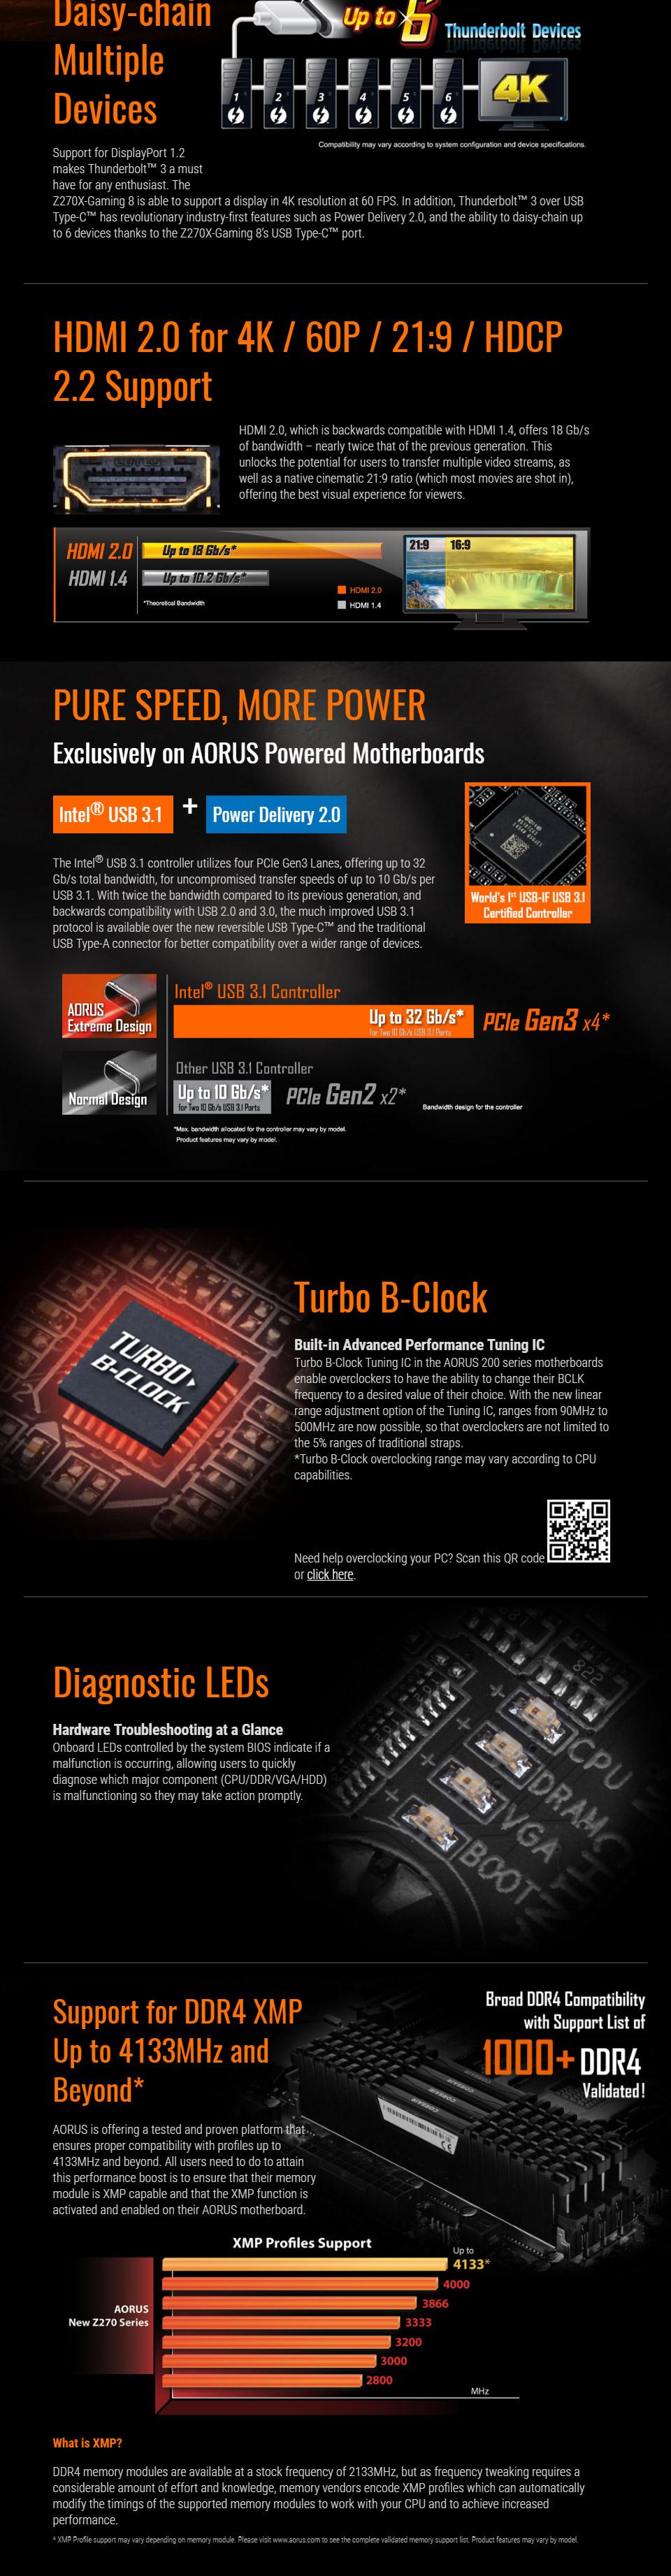 Gigabyte AORUS Z270X-Gaming 8 Motherboard [GA-Z270X-GAMING-8